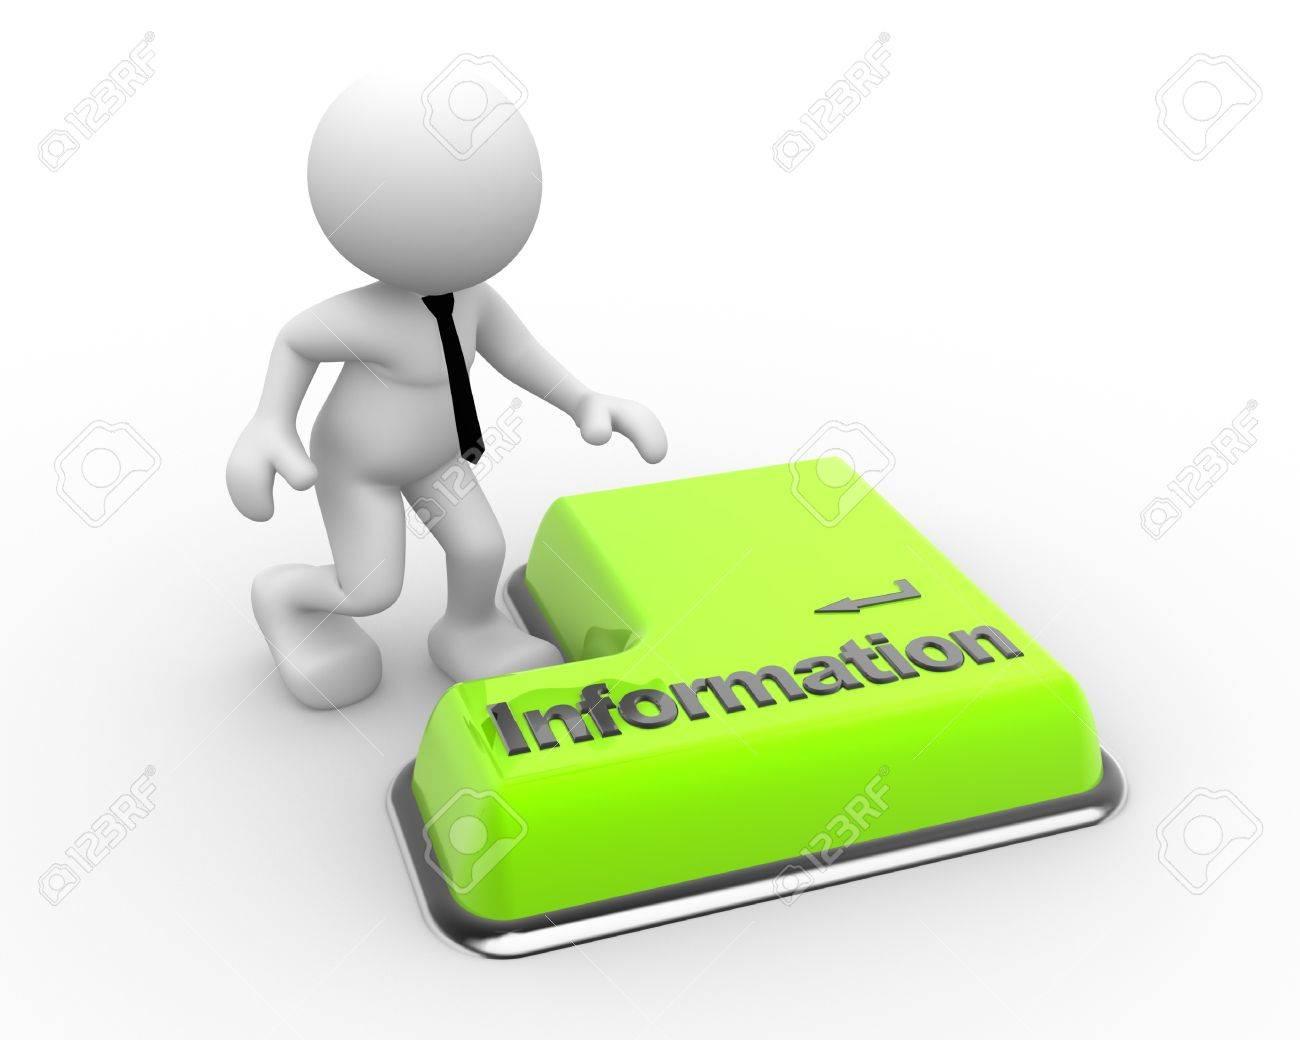 3d people - man, person information keyboard button. Businessman Standard-Bild - 18783990